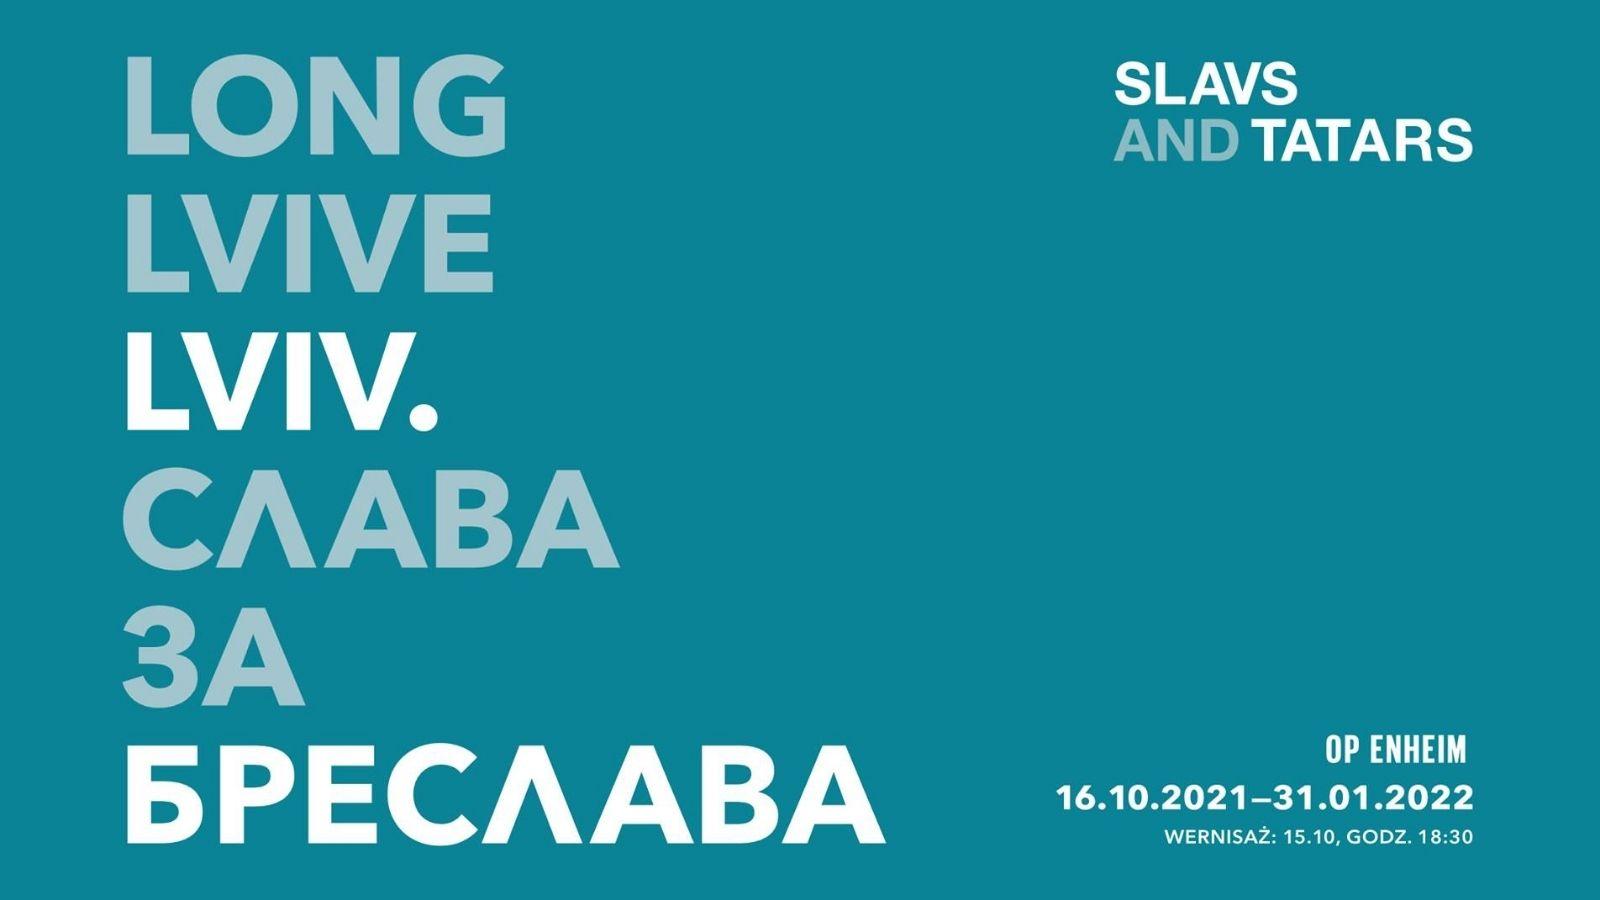 Slavs and Tatars. LONG LVIVE LVIV. СЛАВА ЗА БРЕСЛАВA